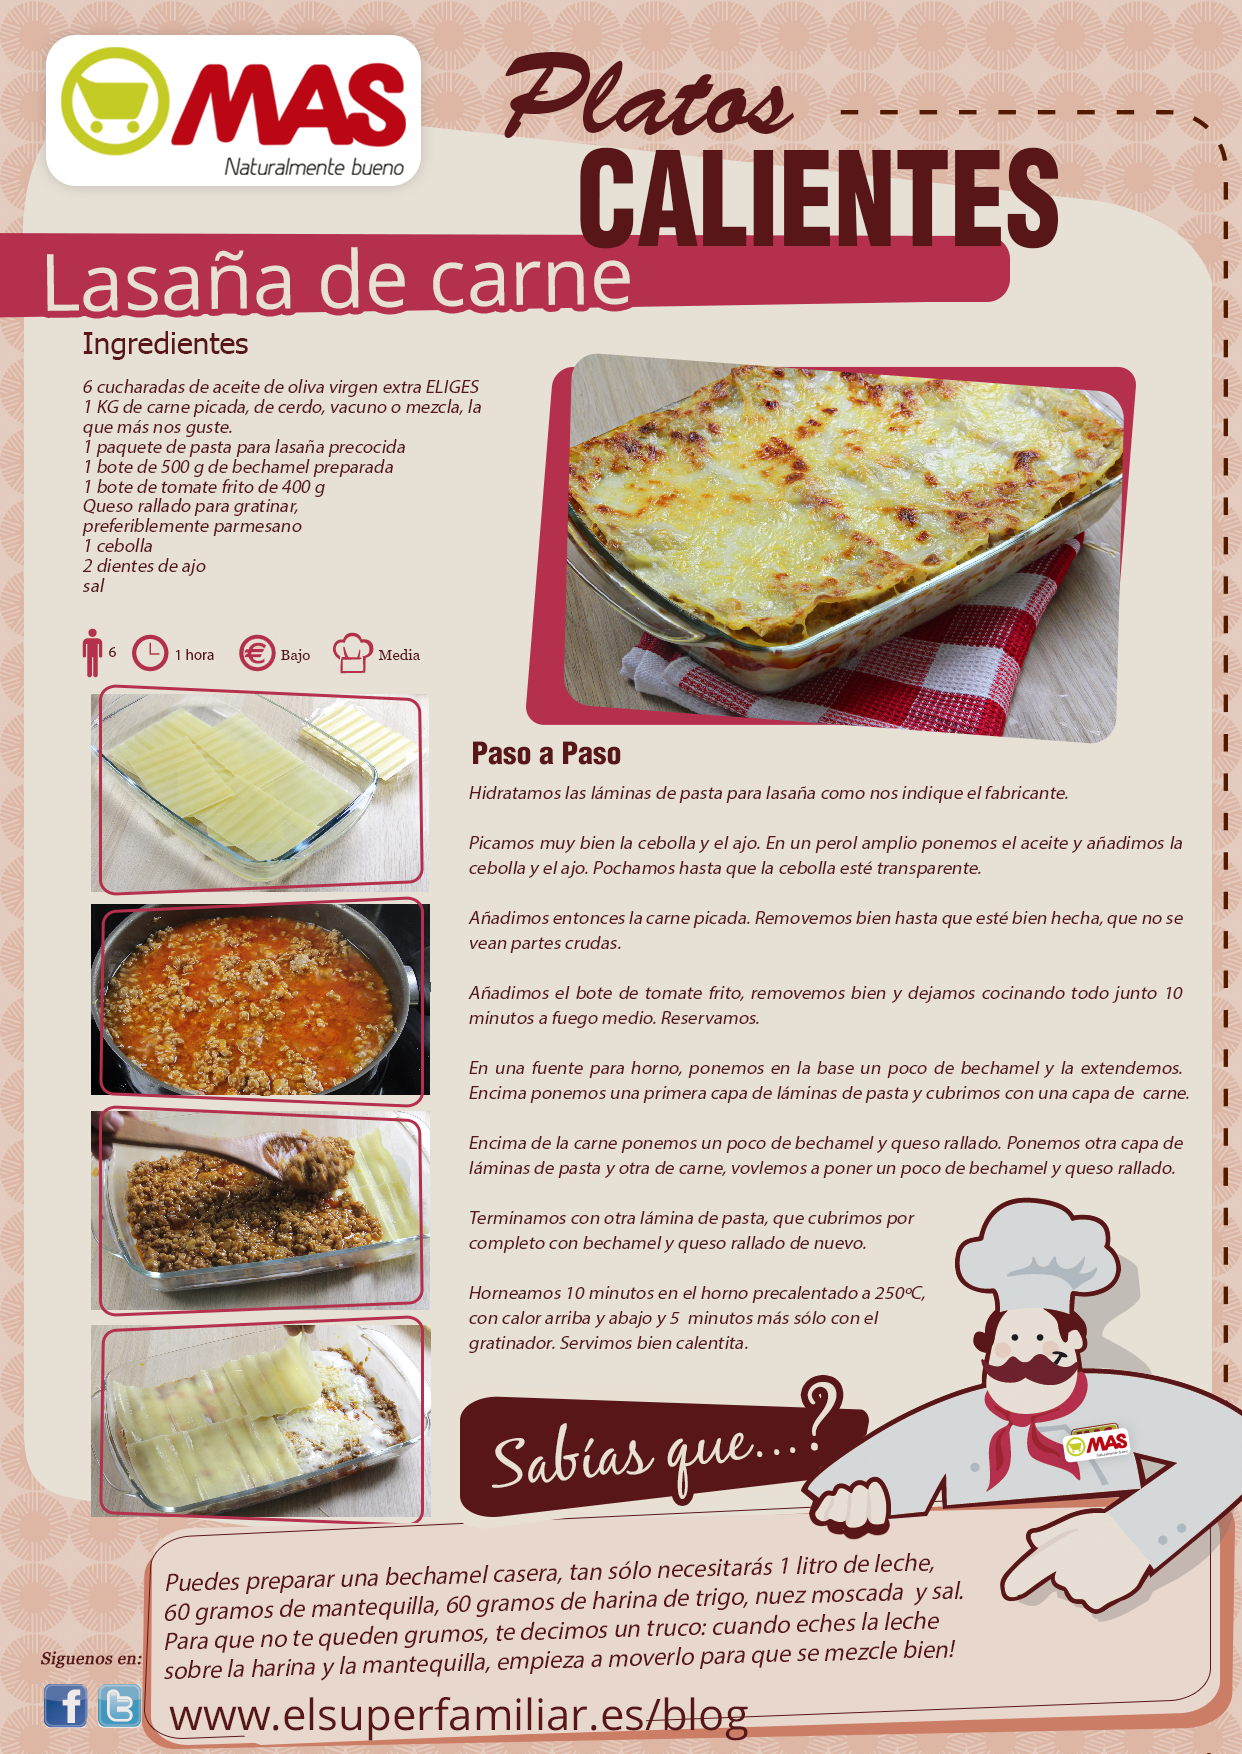 2510641358700695fd4b35537c401a65 - Recetas De Lasaã A De Carne